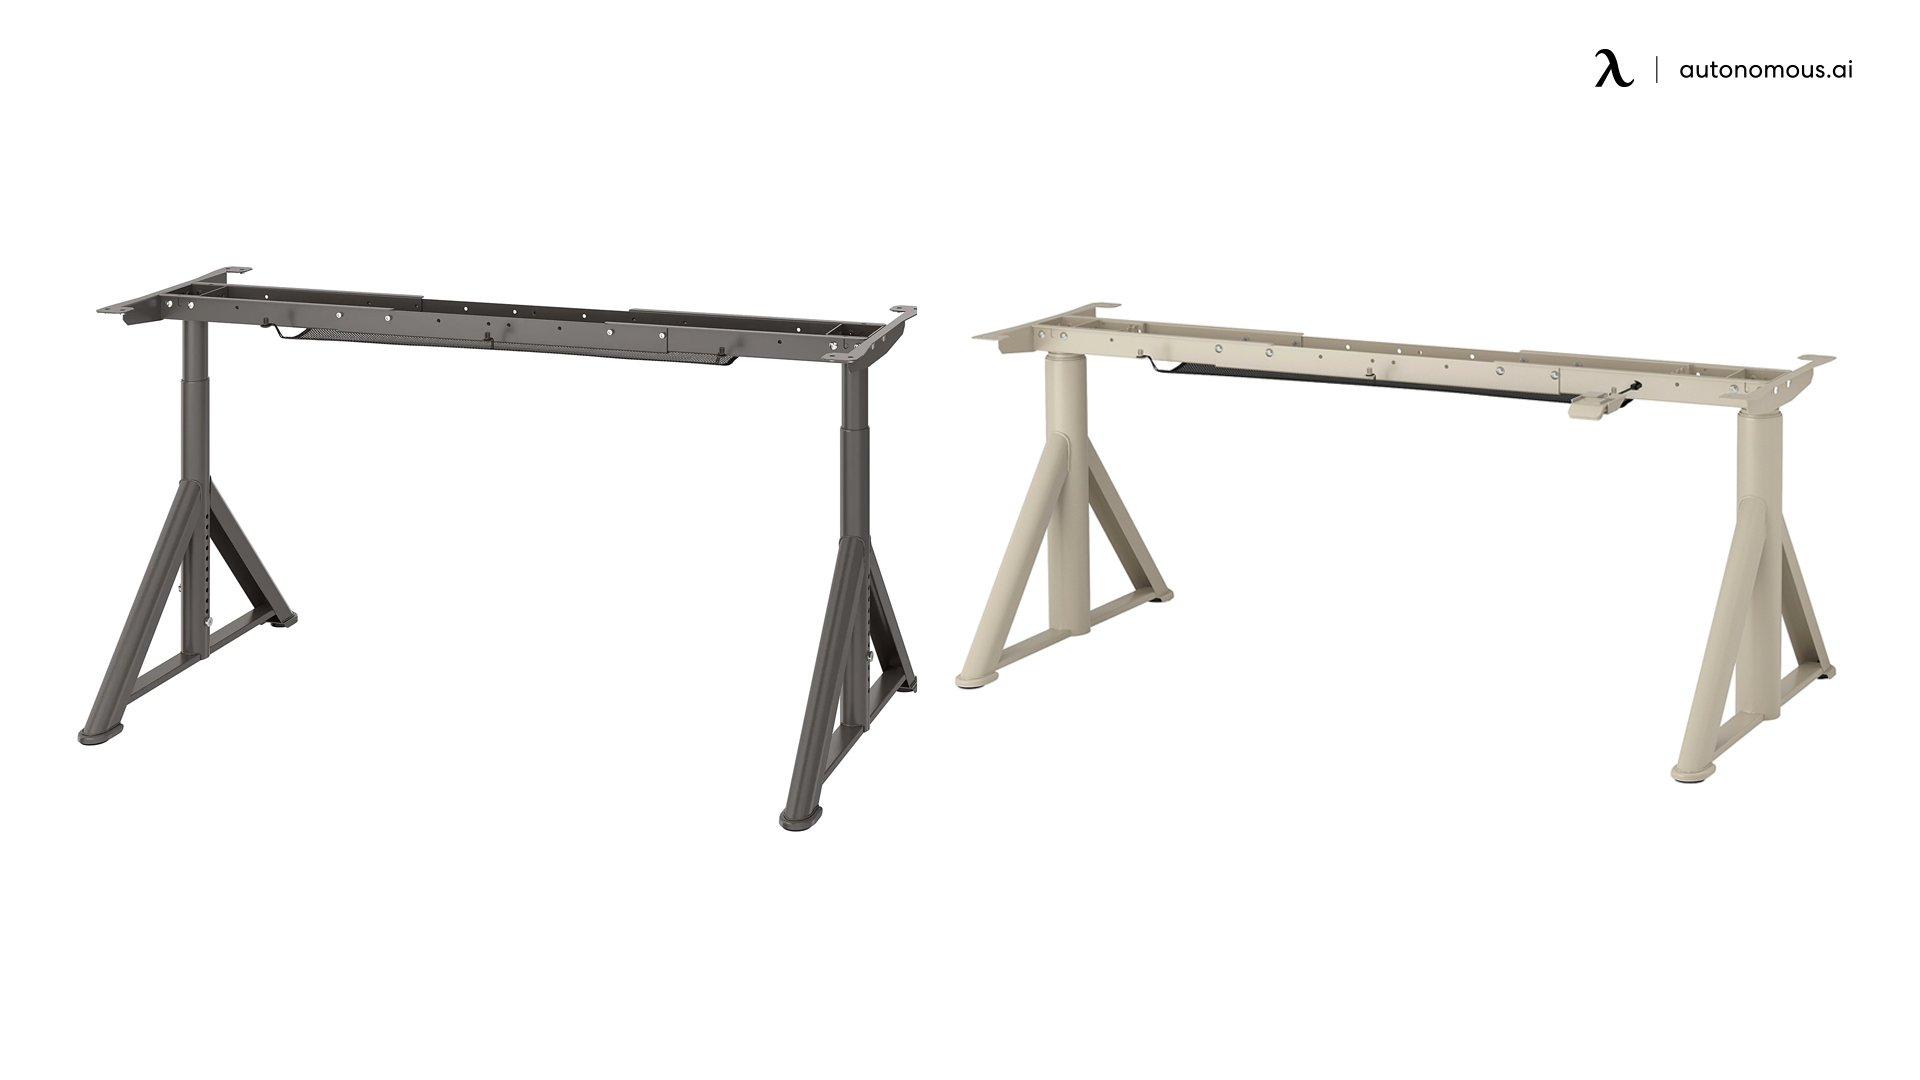 Cadre de bureau debout réglable IKEA Idasen DIY